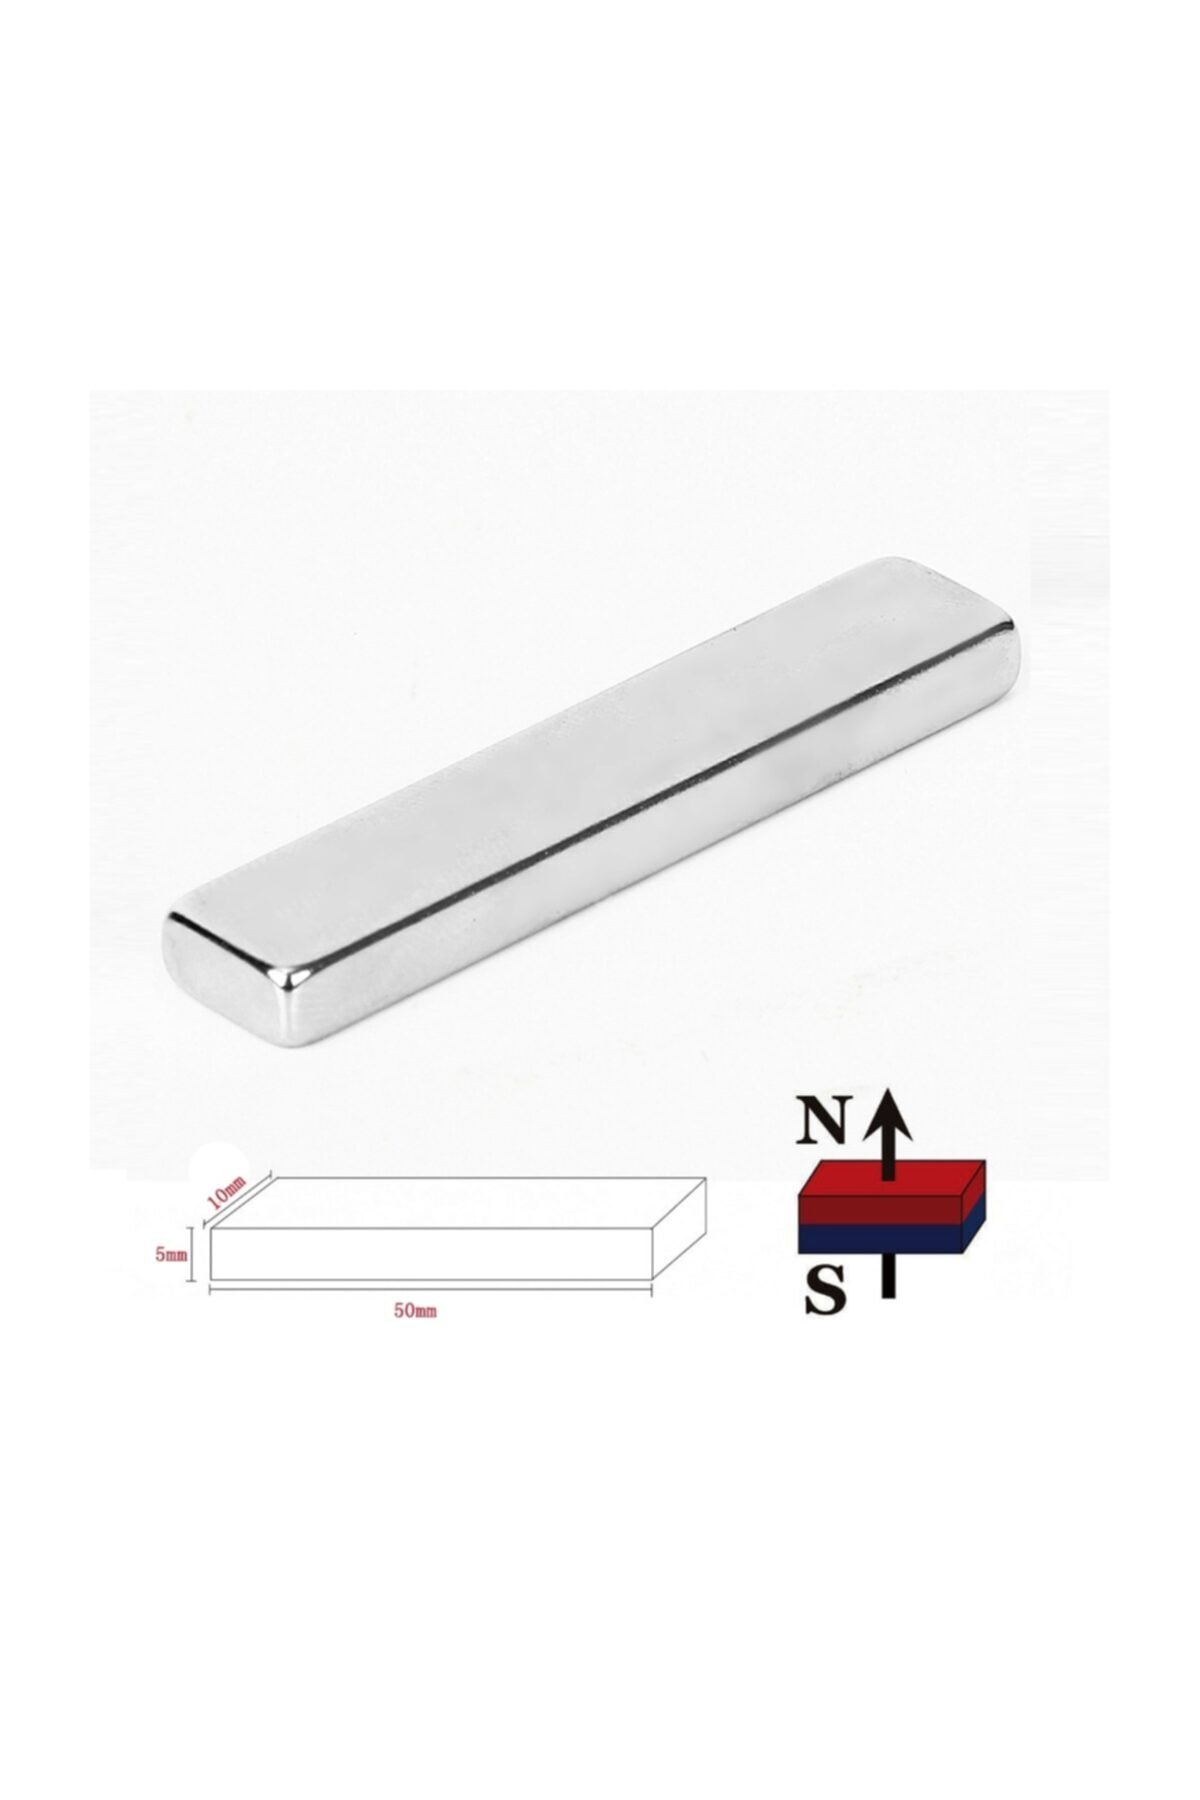 Dünya Magnet 5 Adet Çok Güçlü 50mm X 10mm X 5mm Köşeli Süper Güçlü Neodyum Mıknatıs 1